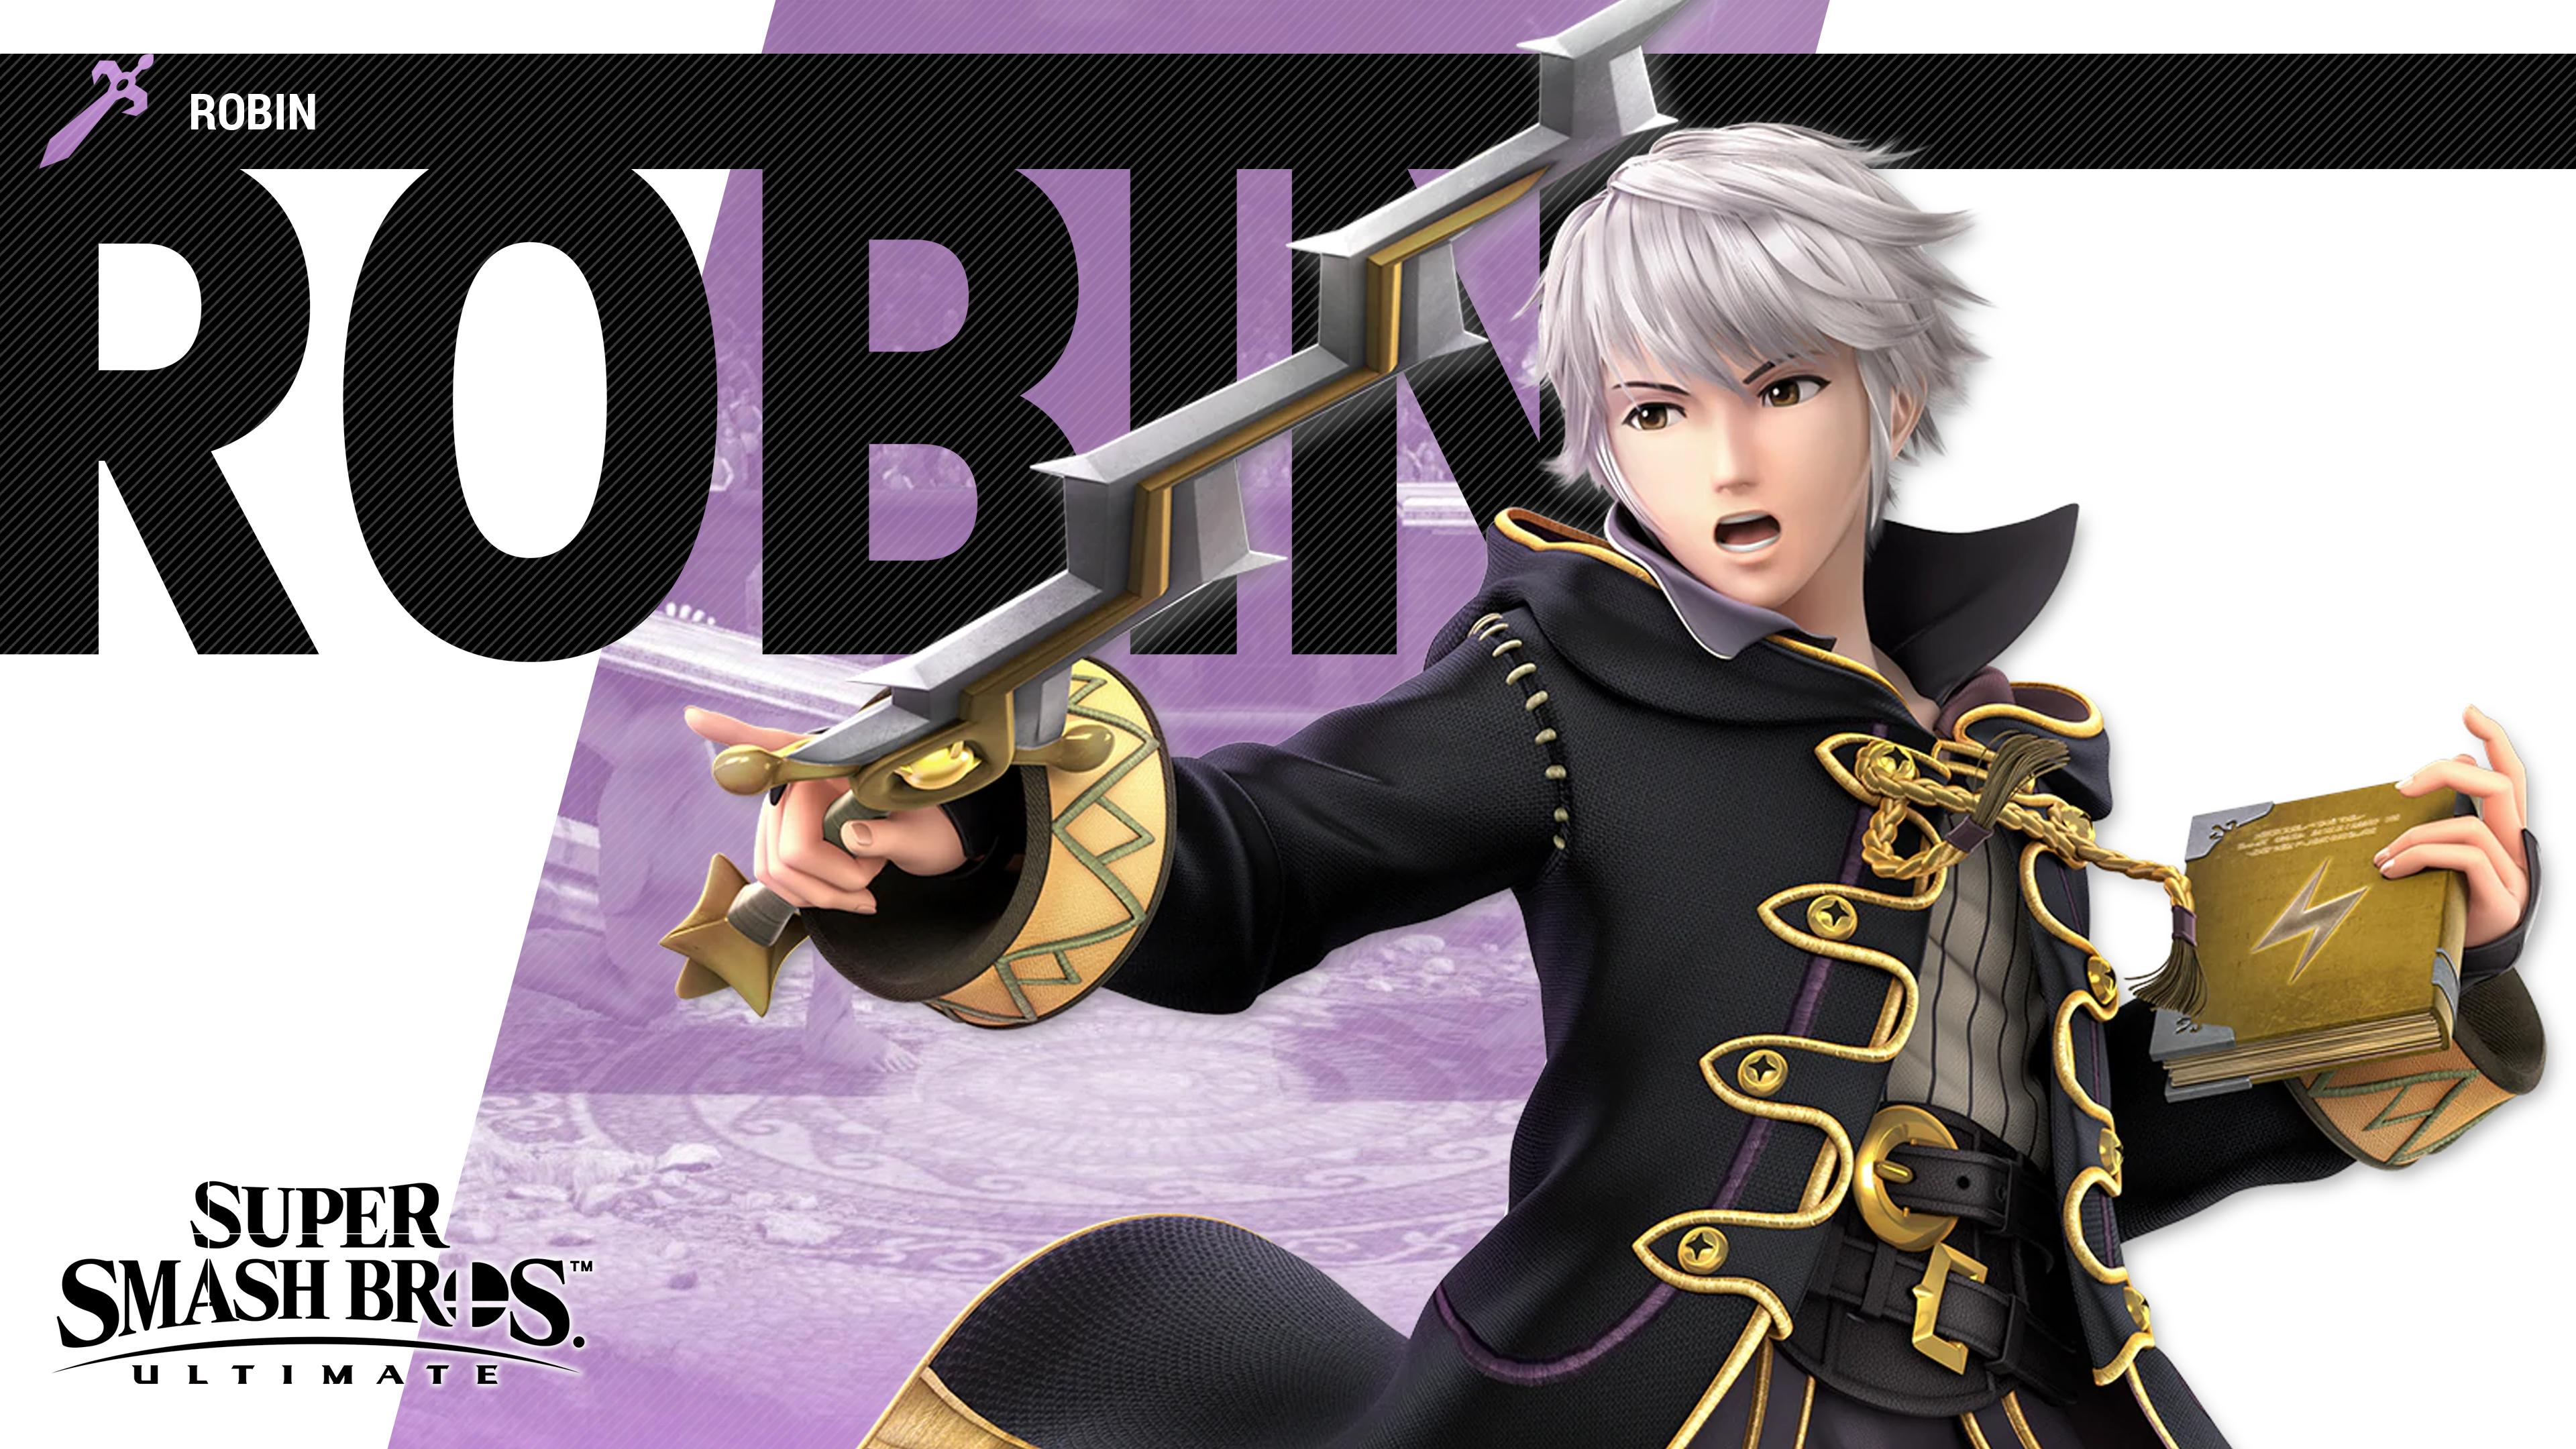 Ssbu 56 Robin Smash Bros Ultimate